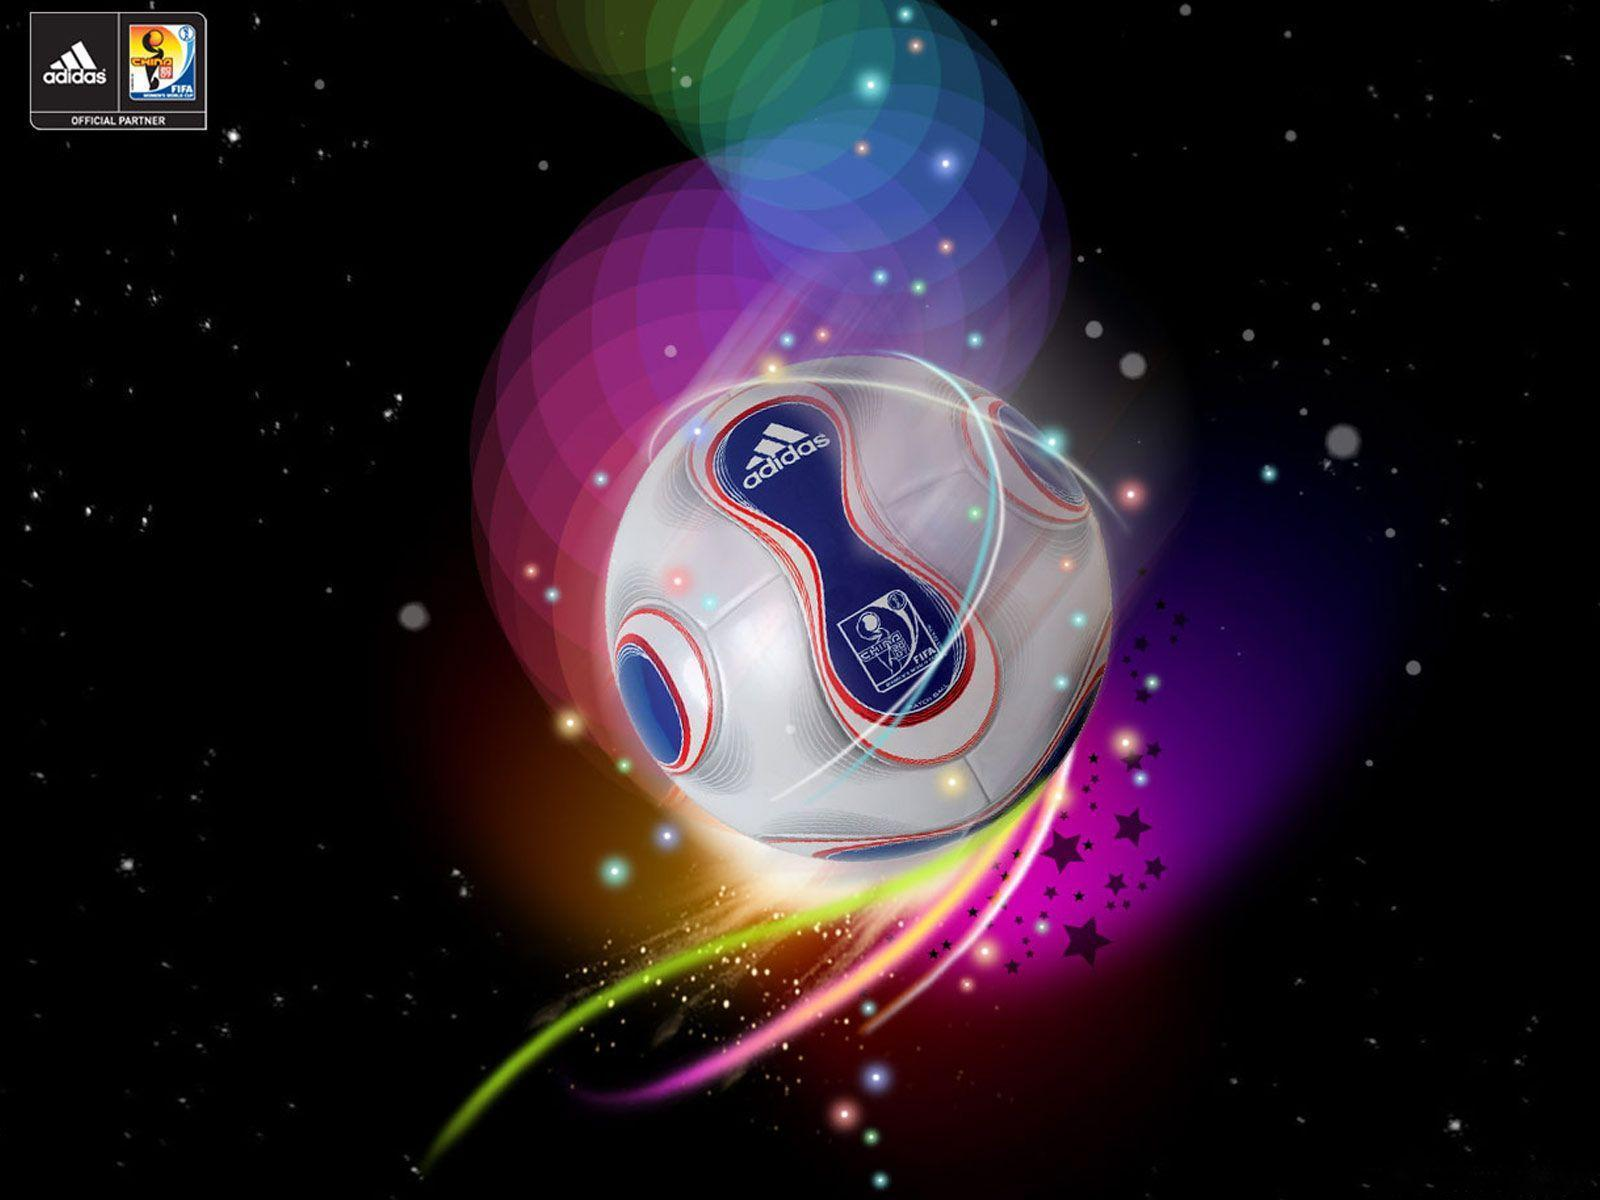 calcio hd wallpapers - photo #22